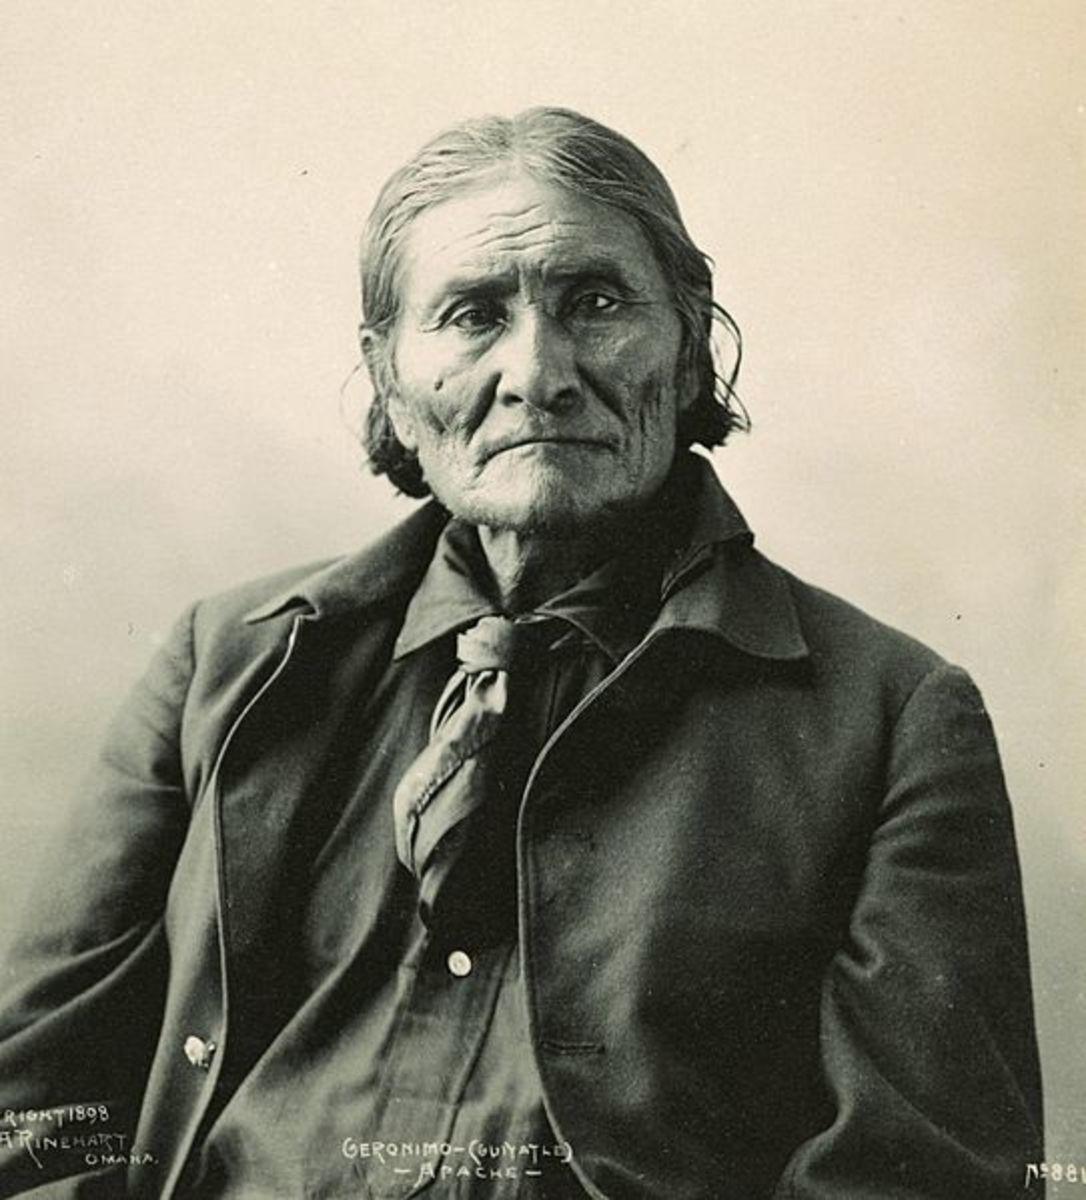 Geronimo, Chiricahua Apache leader. Photograph by Frank A. Rinehart, 1898.